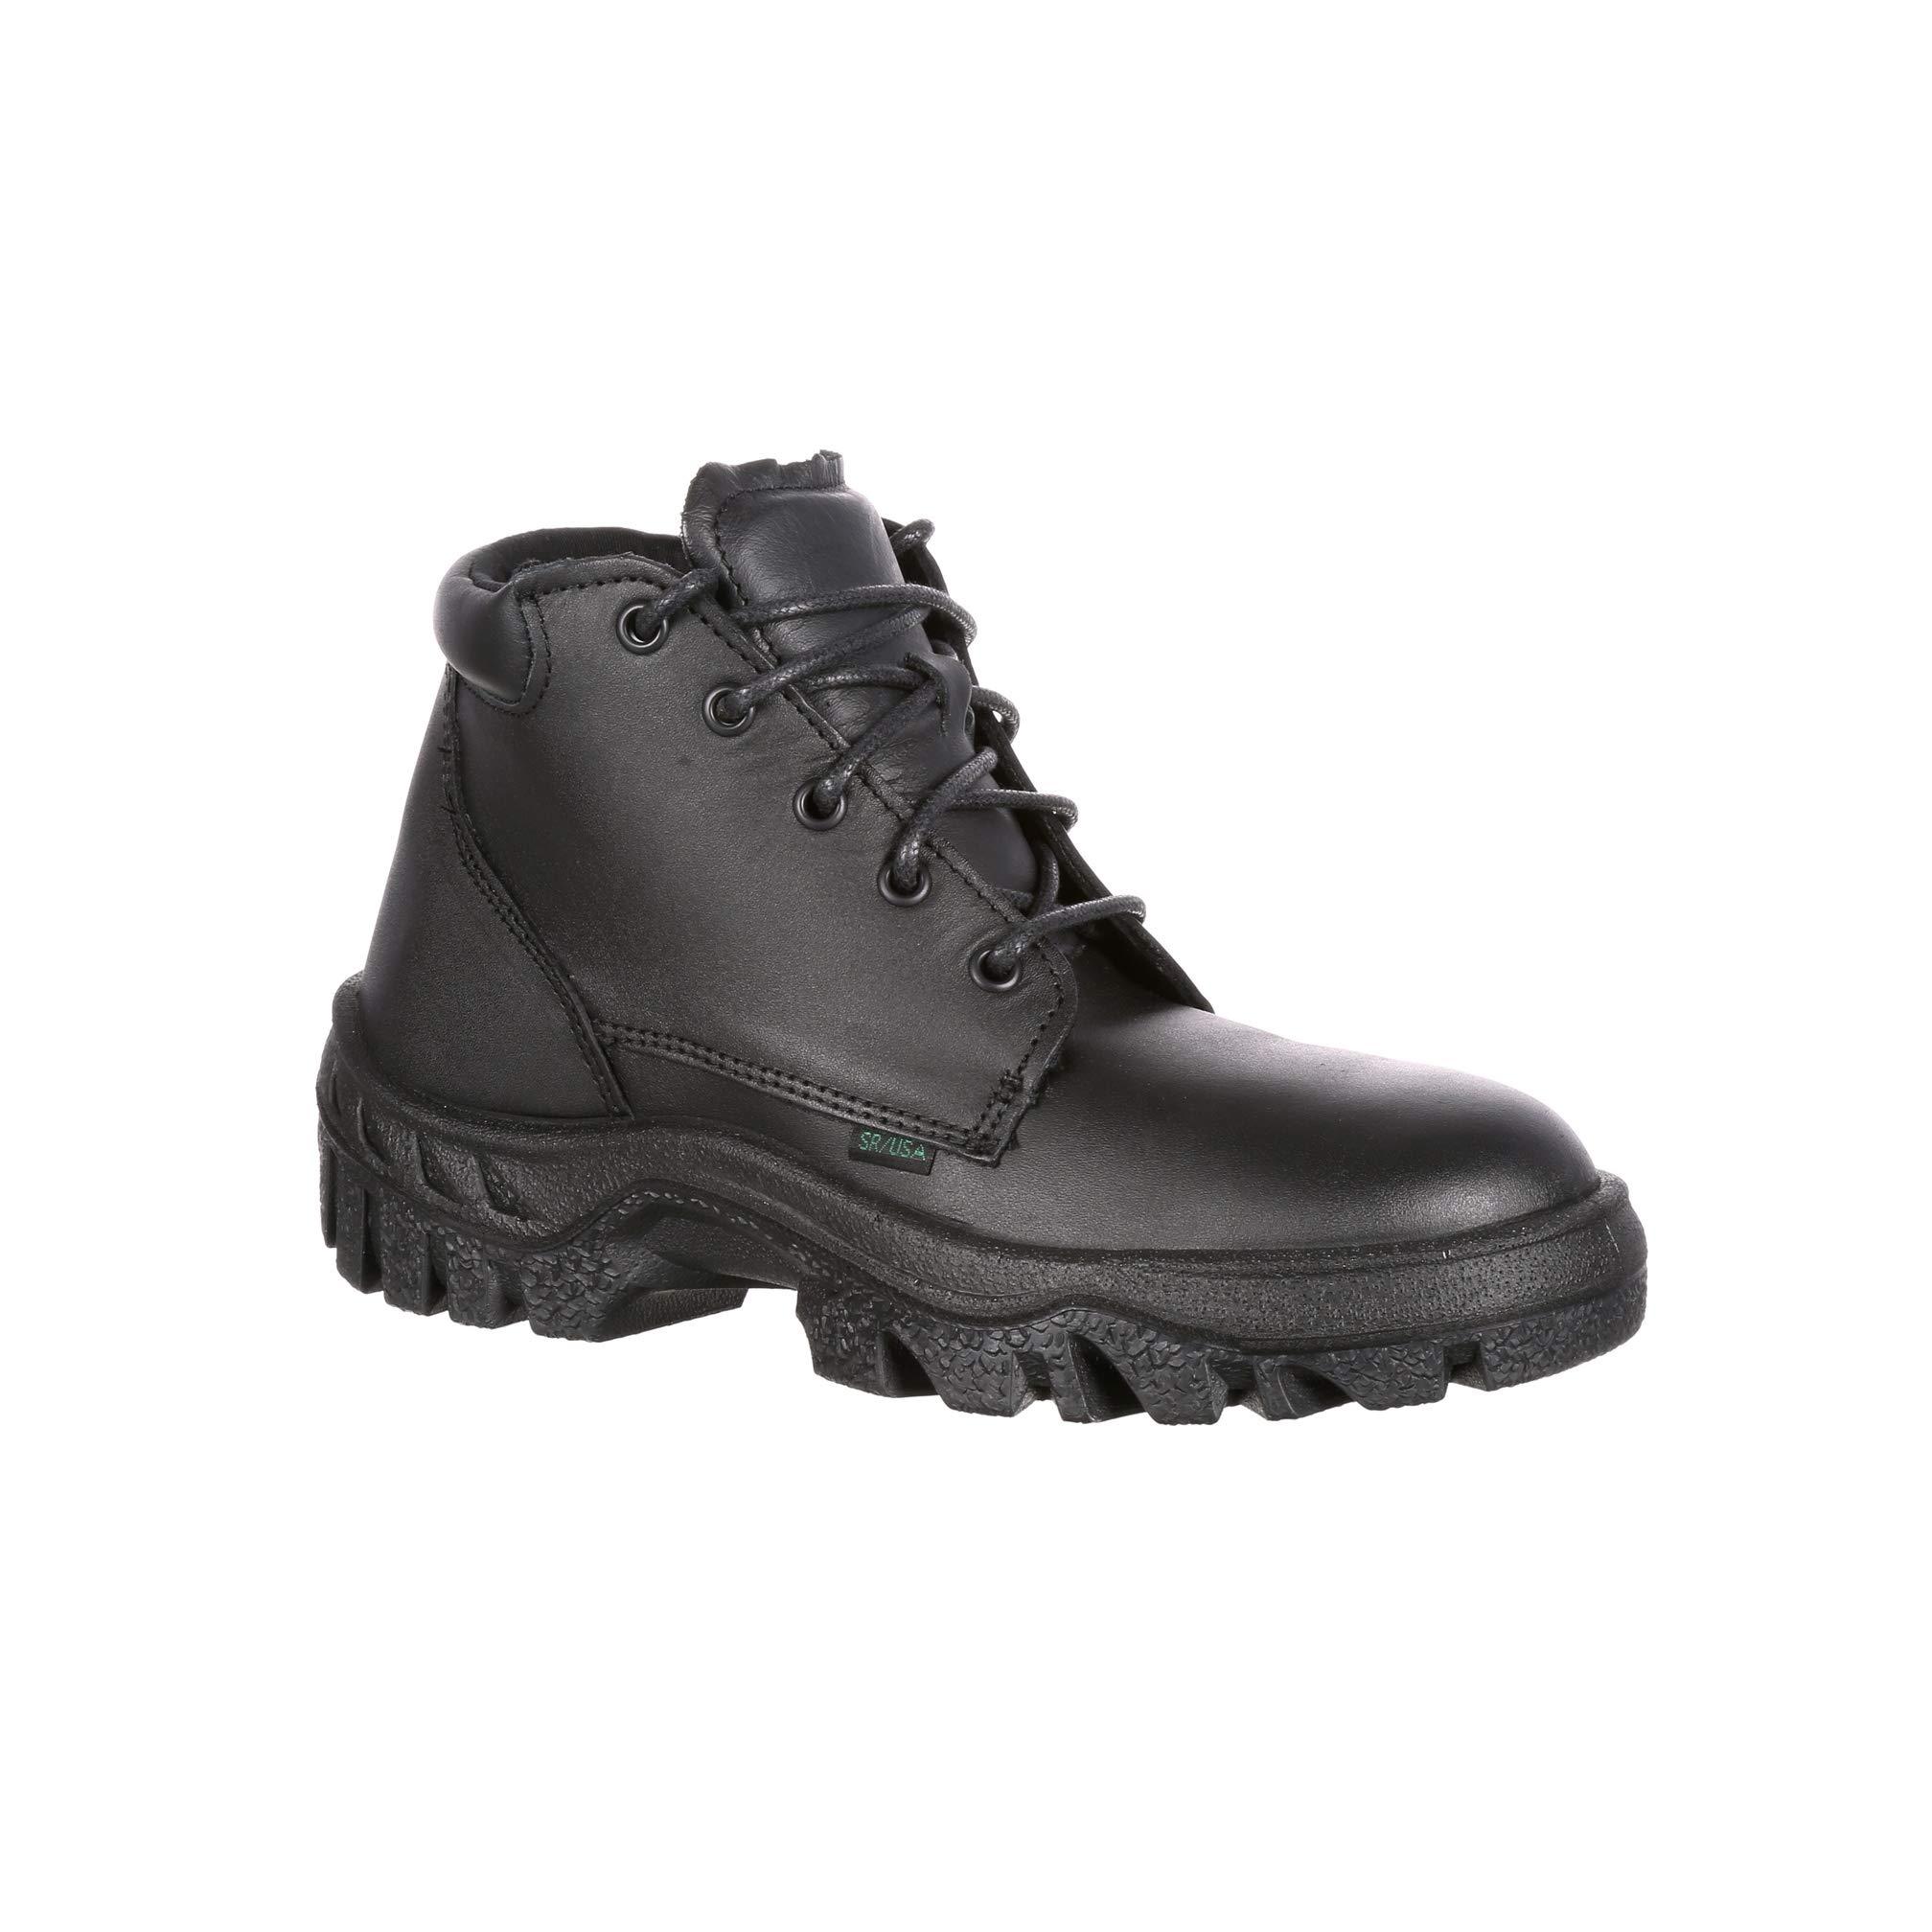 Rocky Women's TMC Postal Approved Chukka Duty Boot-5105